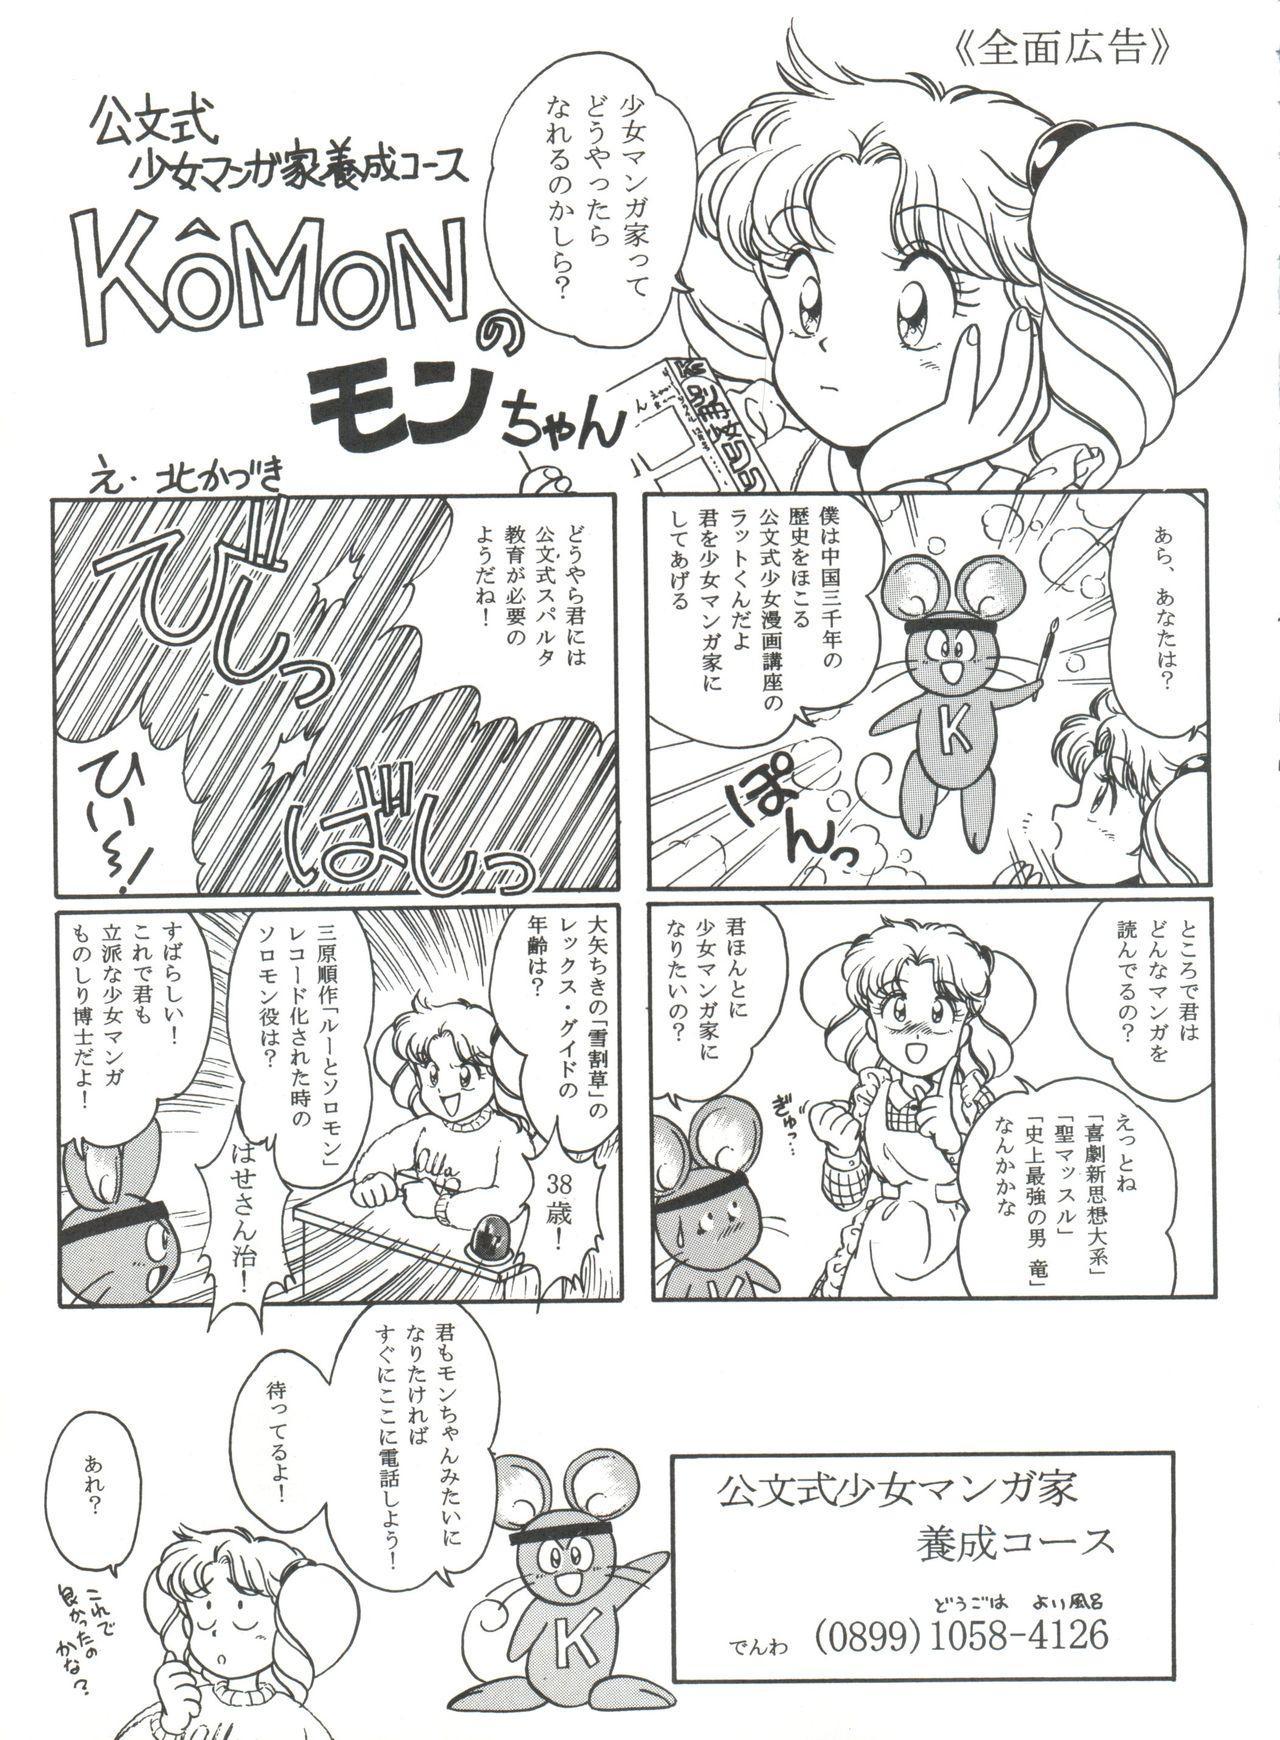 Hara Hara Dokei Vol. 4 Quattro 87